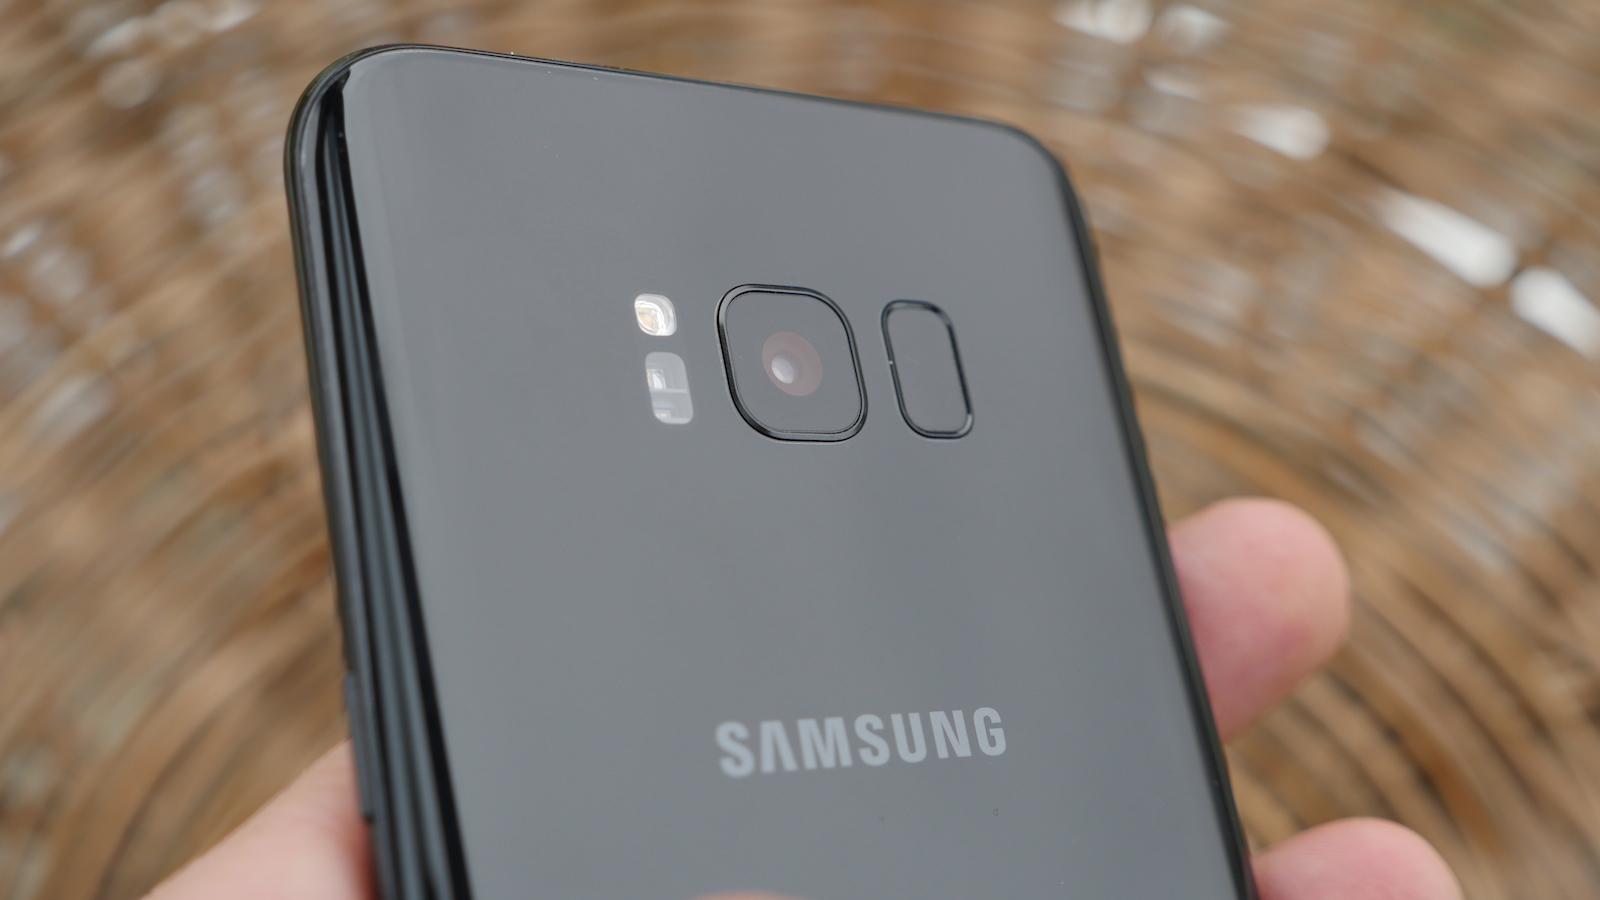 samsung galaxy s8, windows 10 mobile, ativ s8